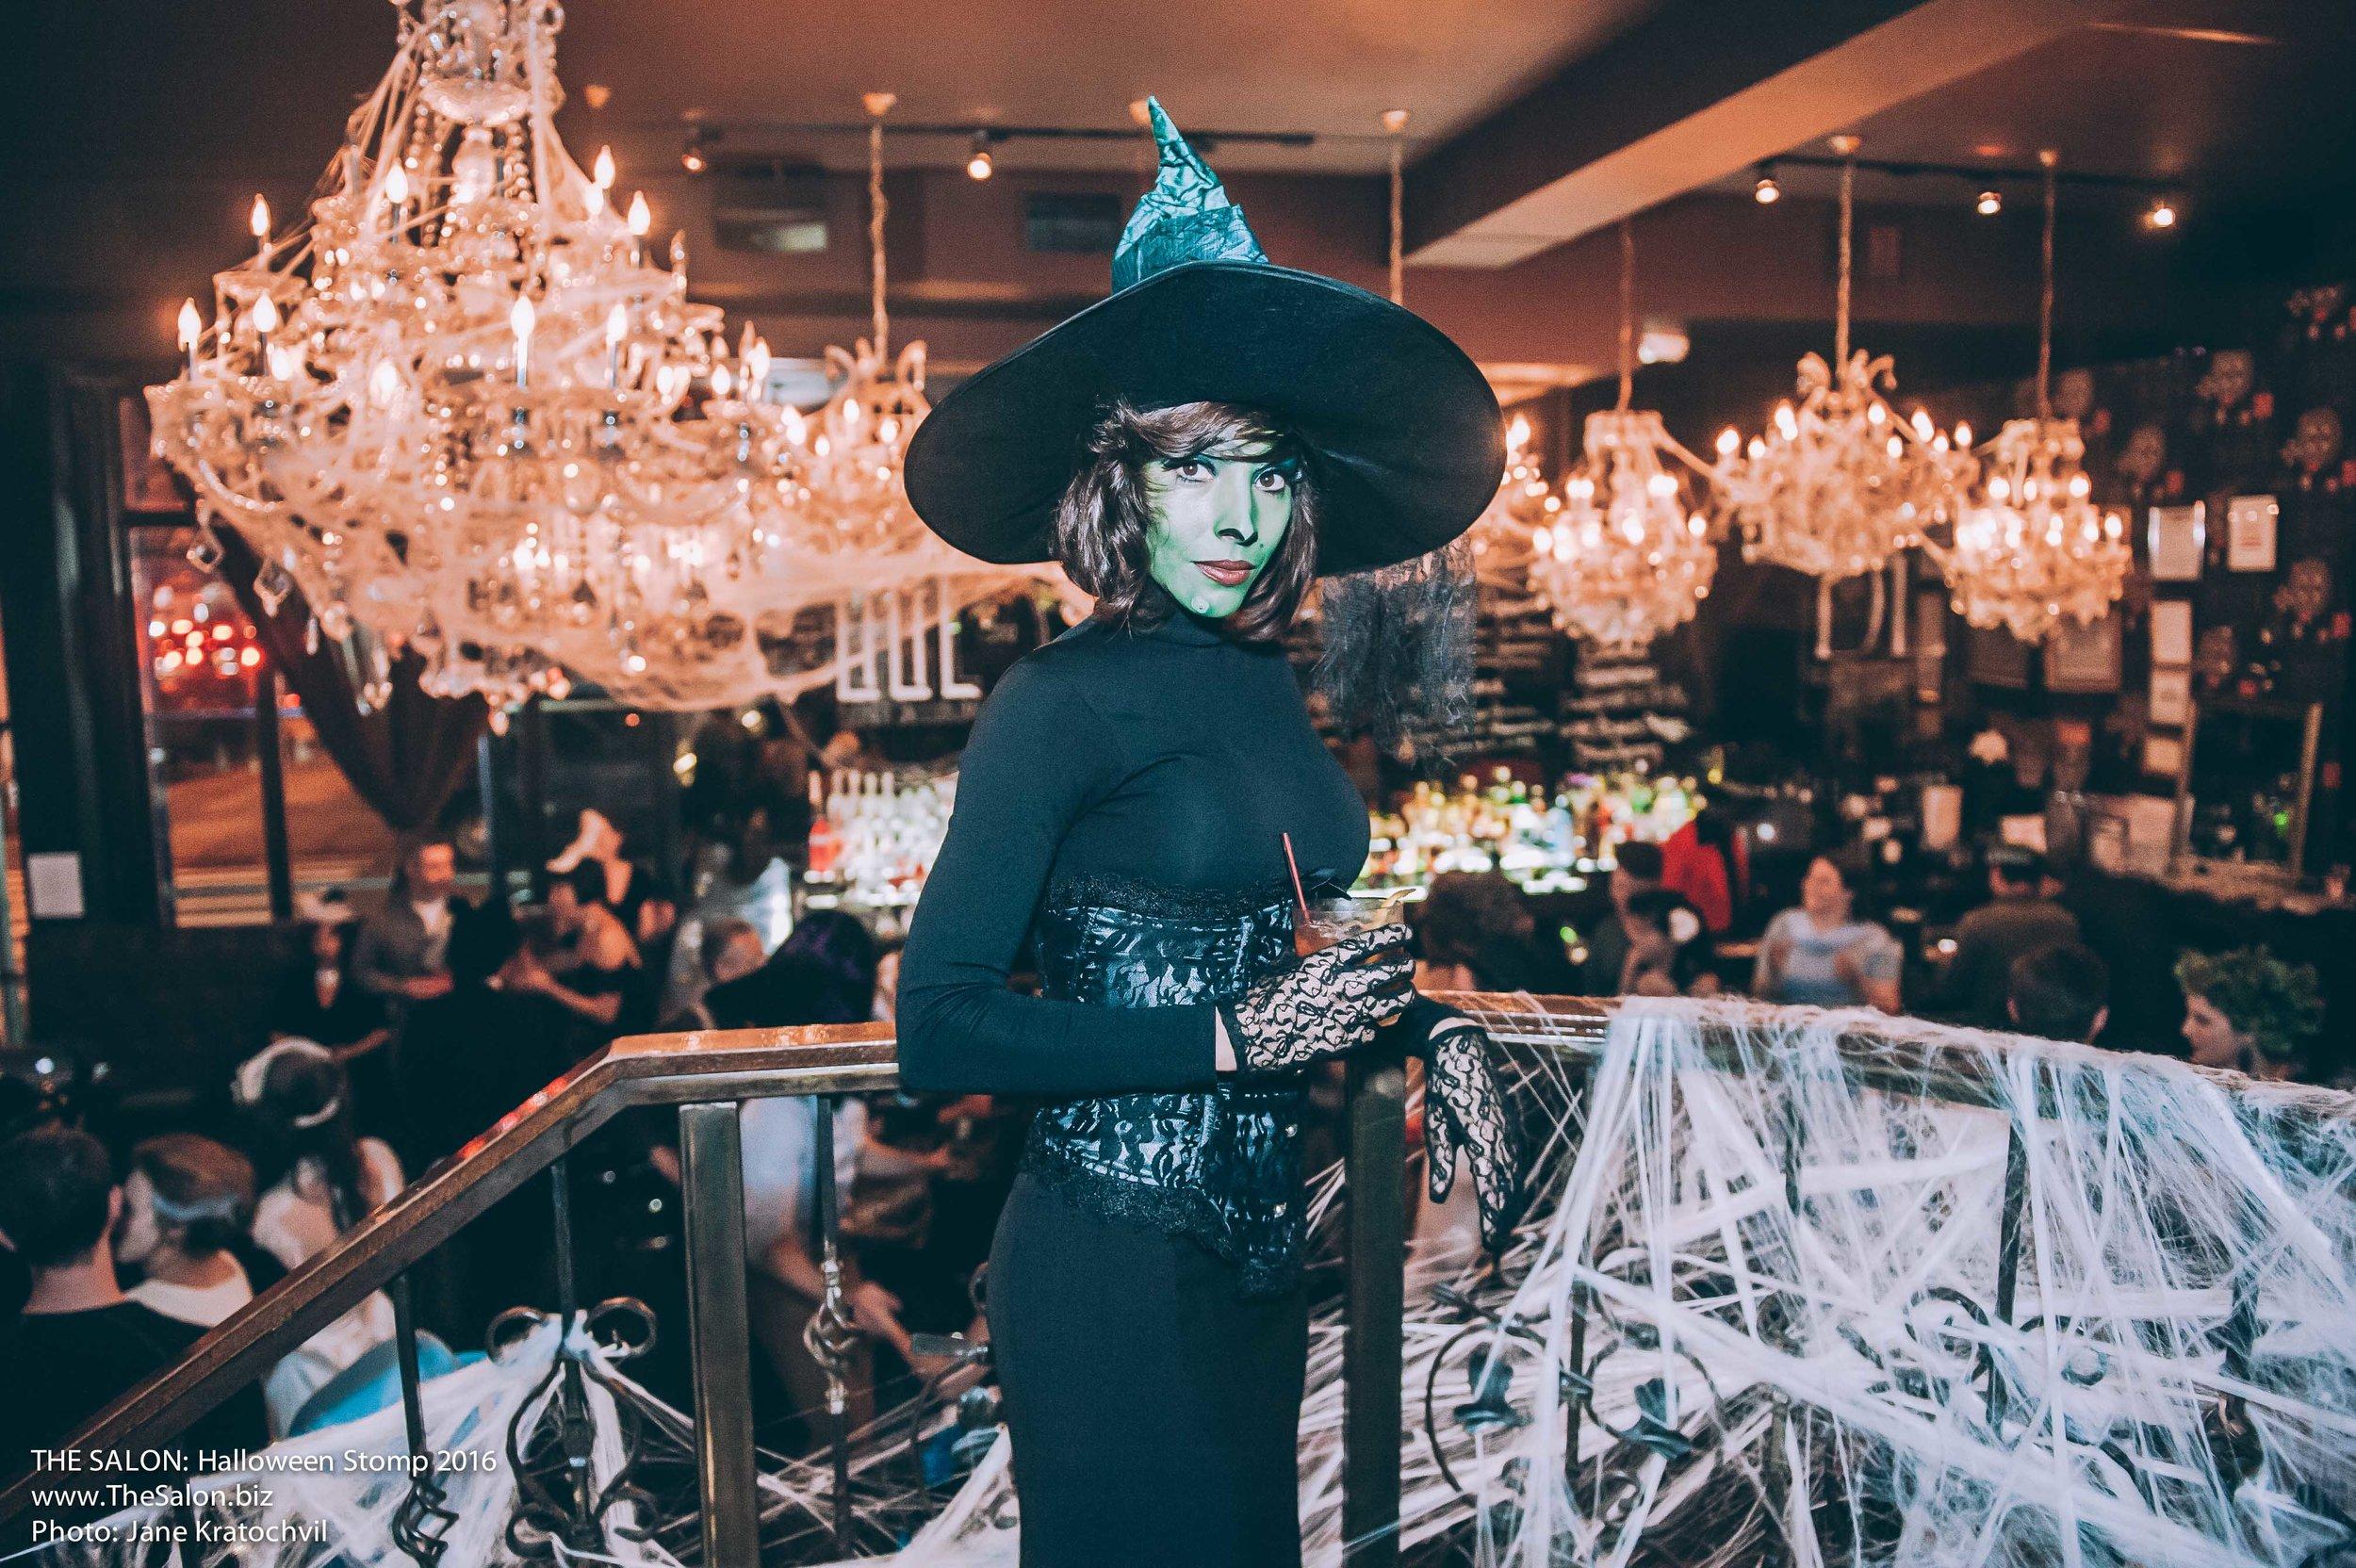 THE-SALON_HalloweenStomp16__photocredit-jane-kratochvil_1129.jpg